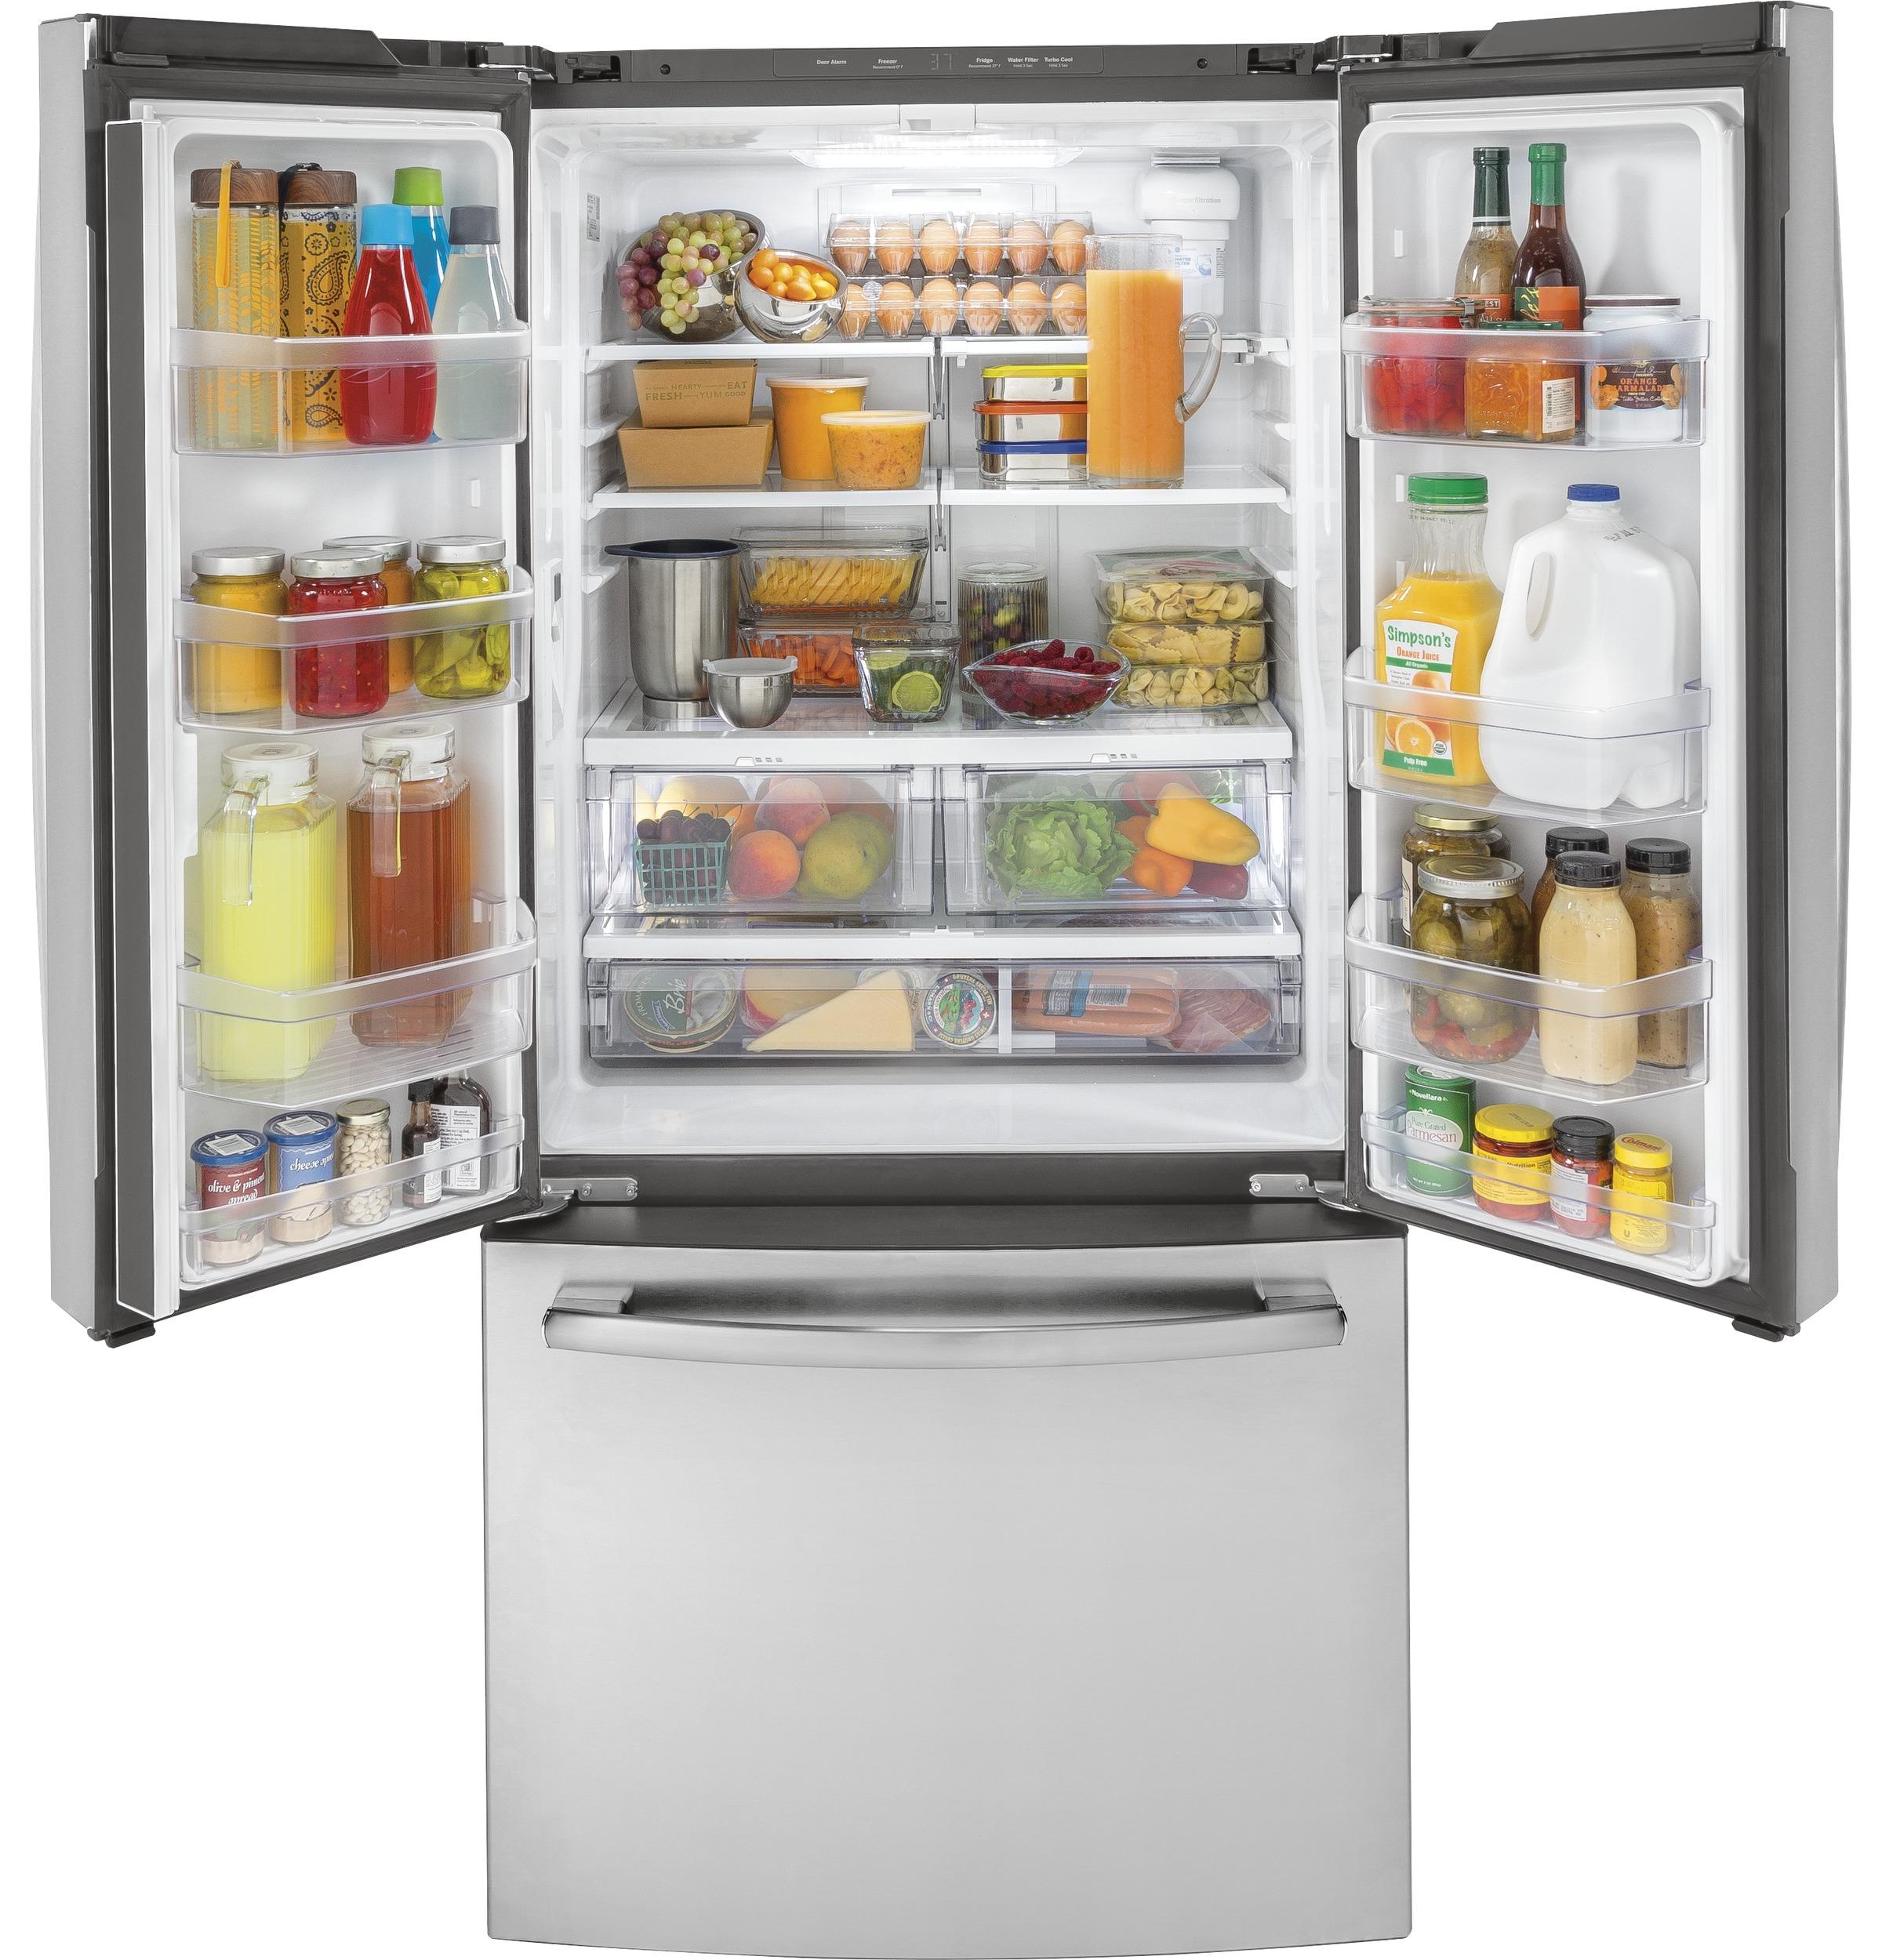 Model: GWE19JSLSS | GE® ENERGY STAR® 18.6 Cu. Ft. Counter-Depth French-Door Refrigerator